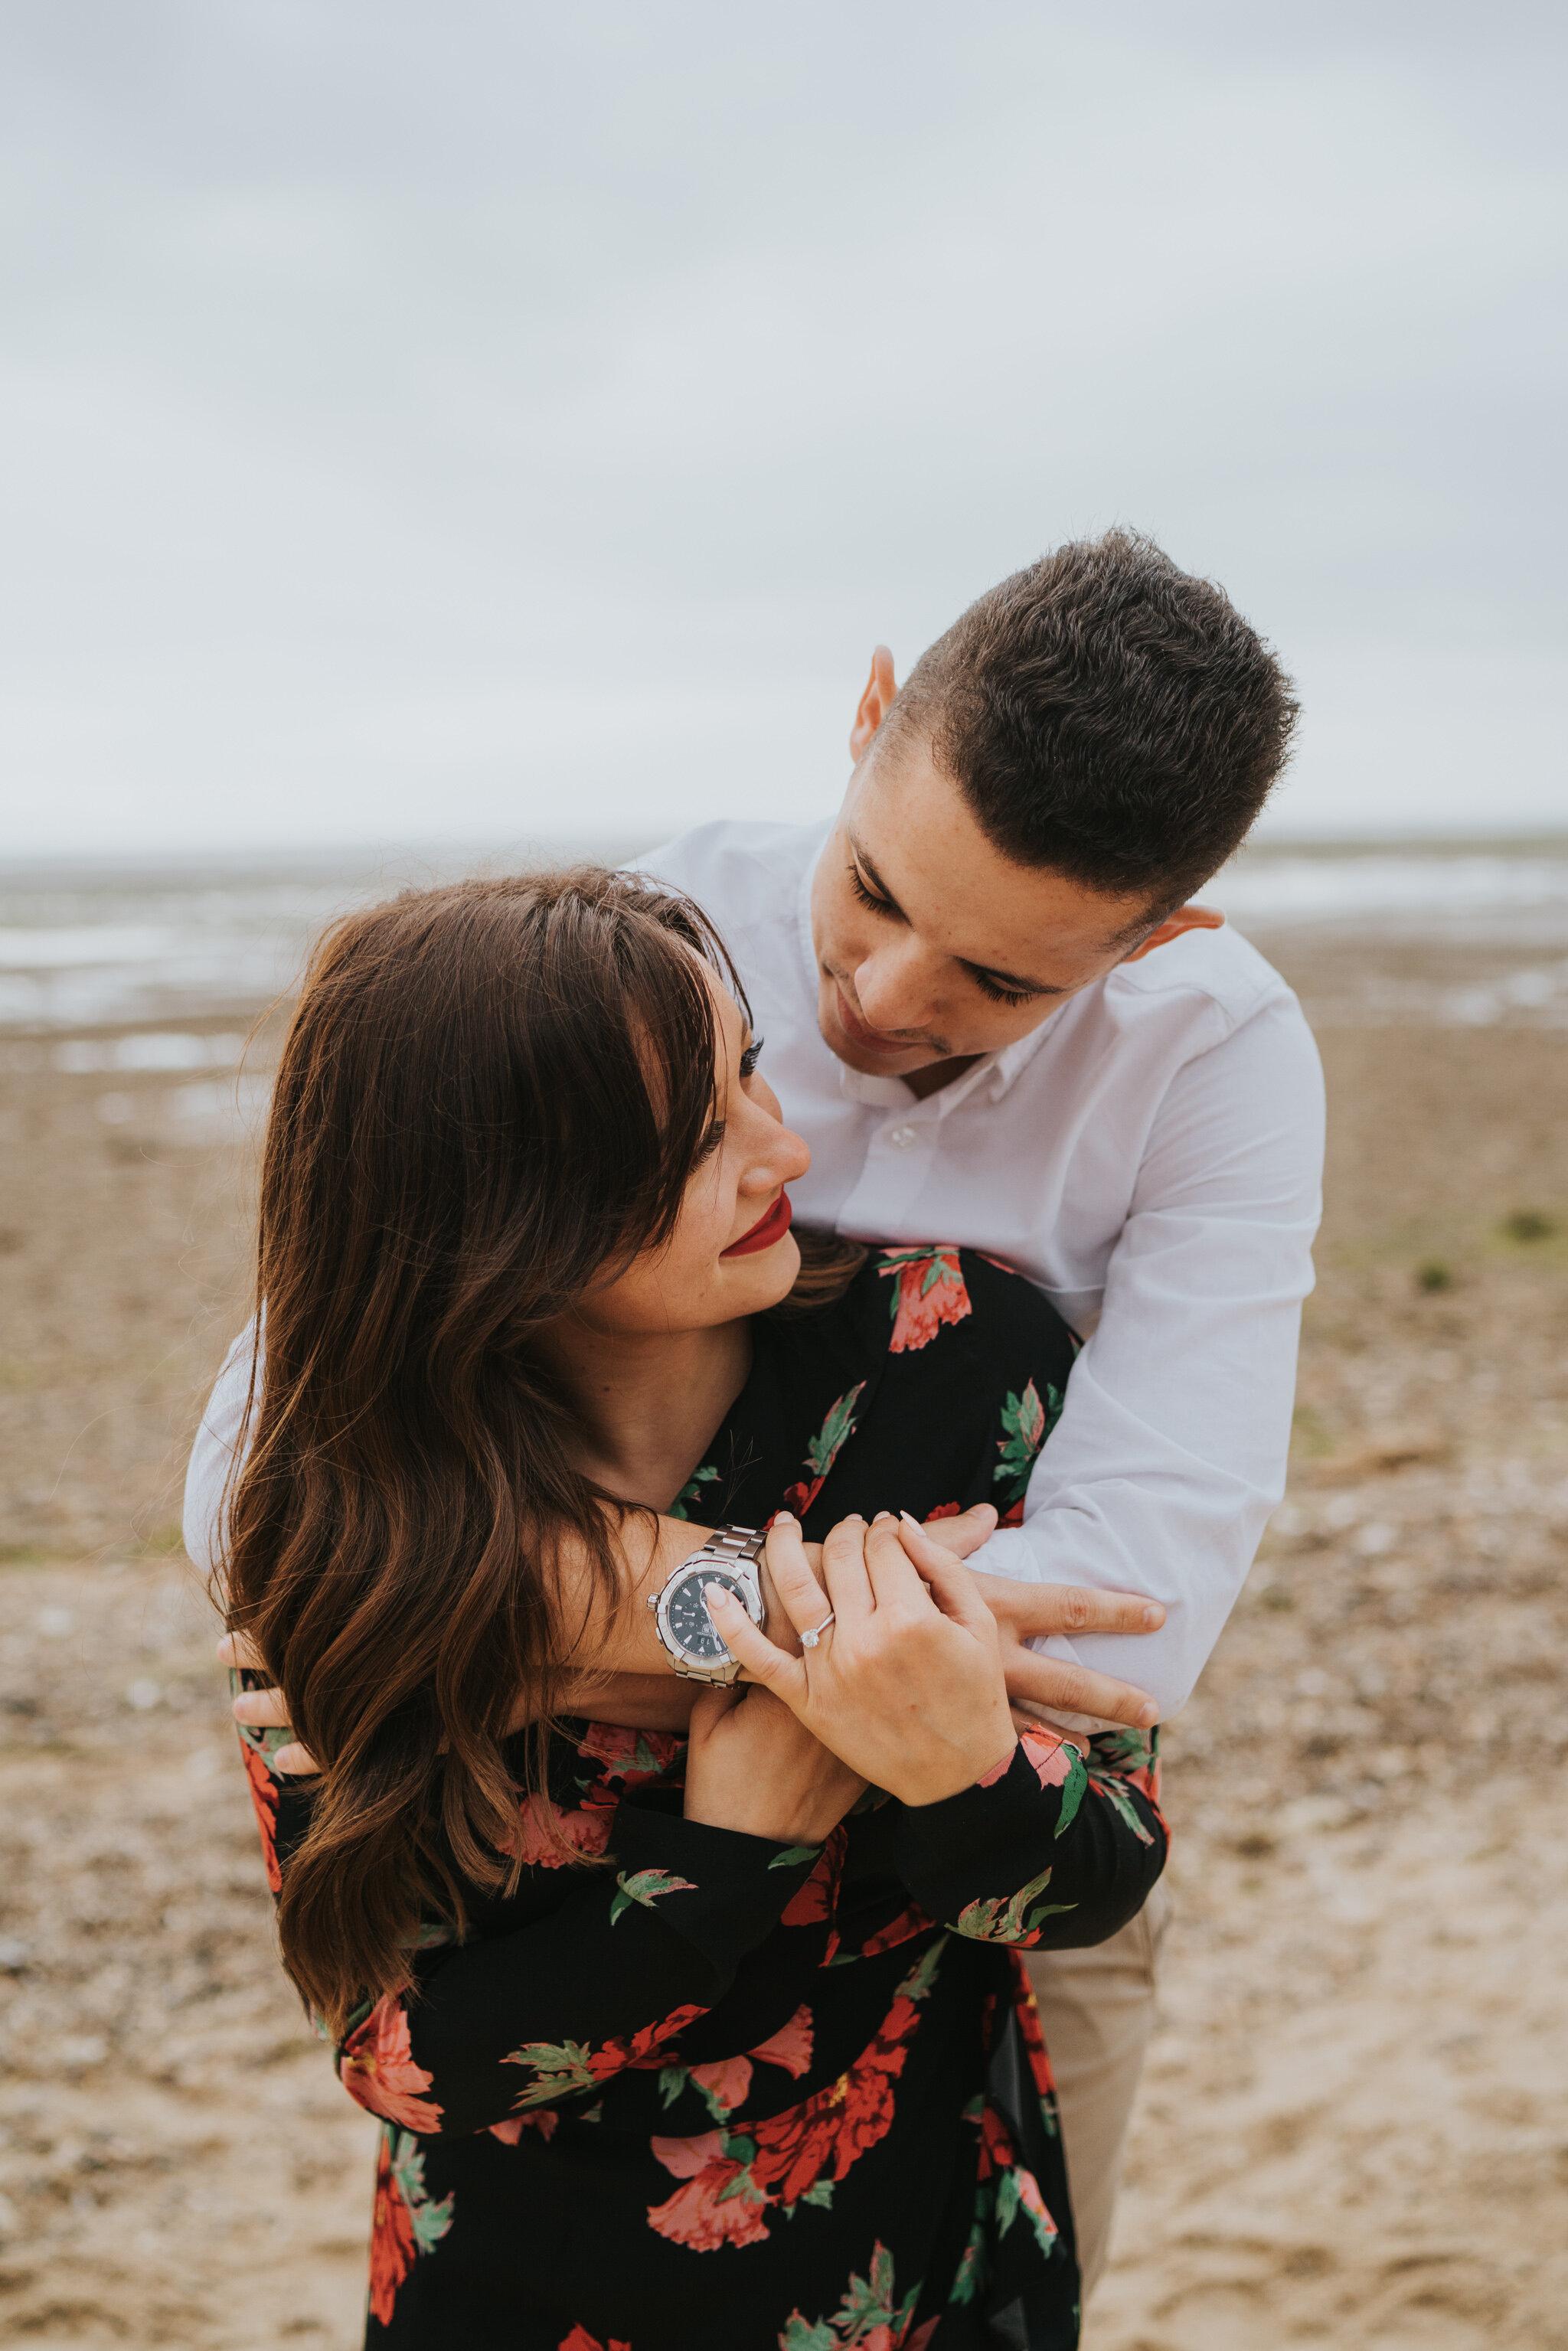 engagement-pre-wedding-hannah-michael-cudmore-grove-east-mersea-grace-elizabeth-colchester-essex-devon-suffolk-and-norfolk-alternative-wedding-and-family-photographer (49 of 51).jpg